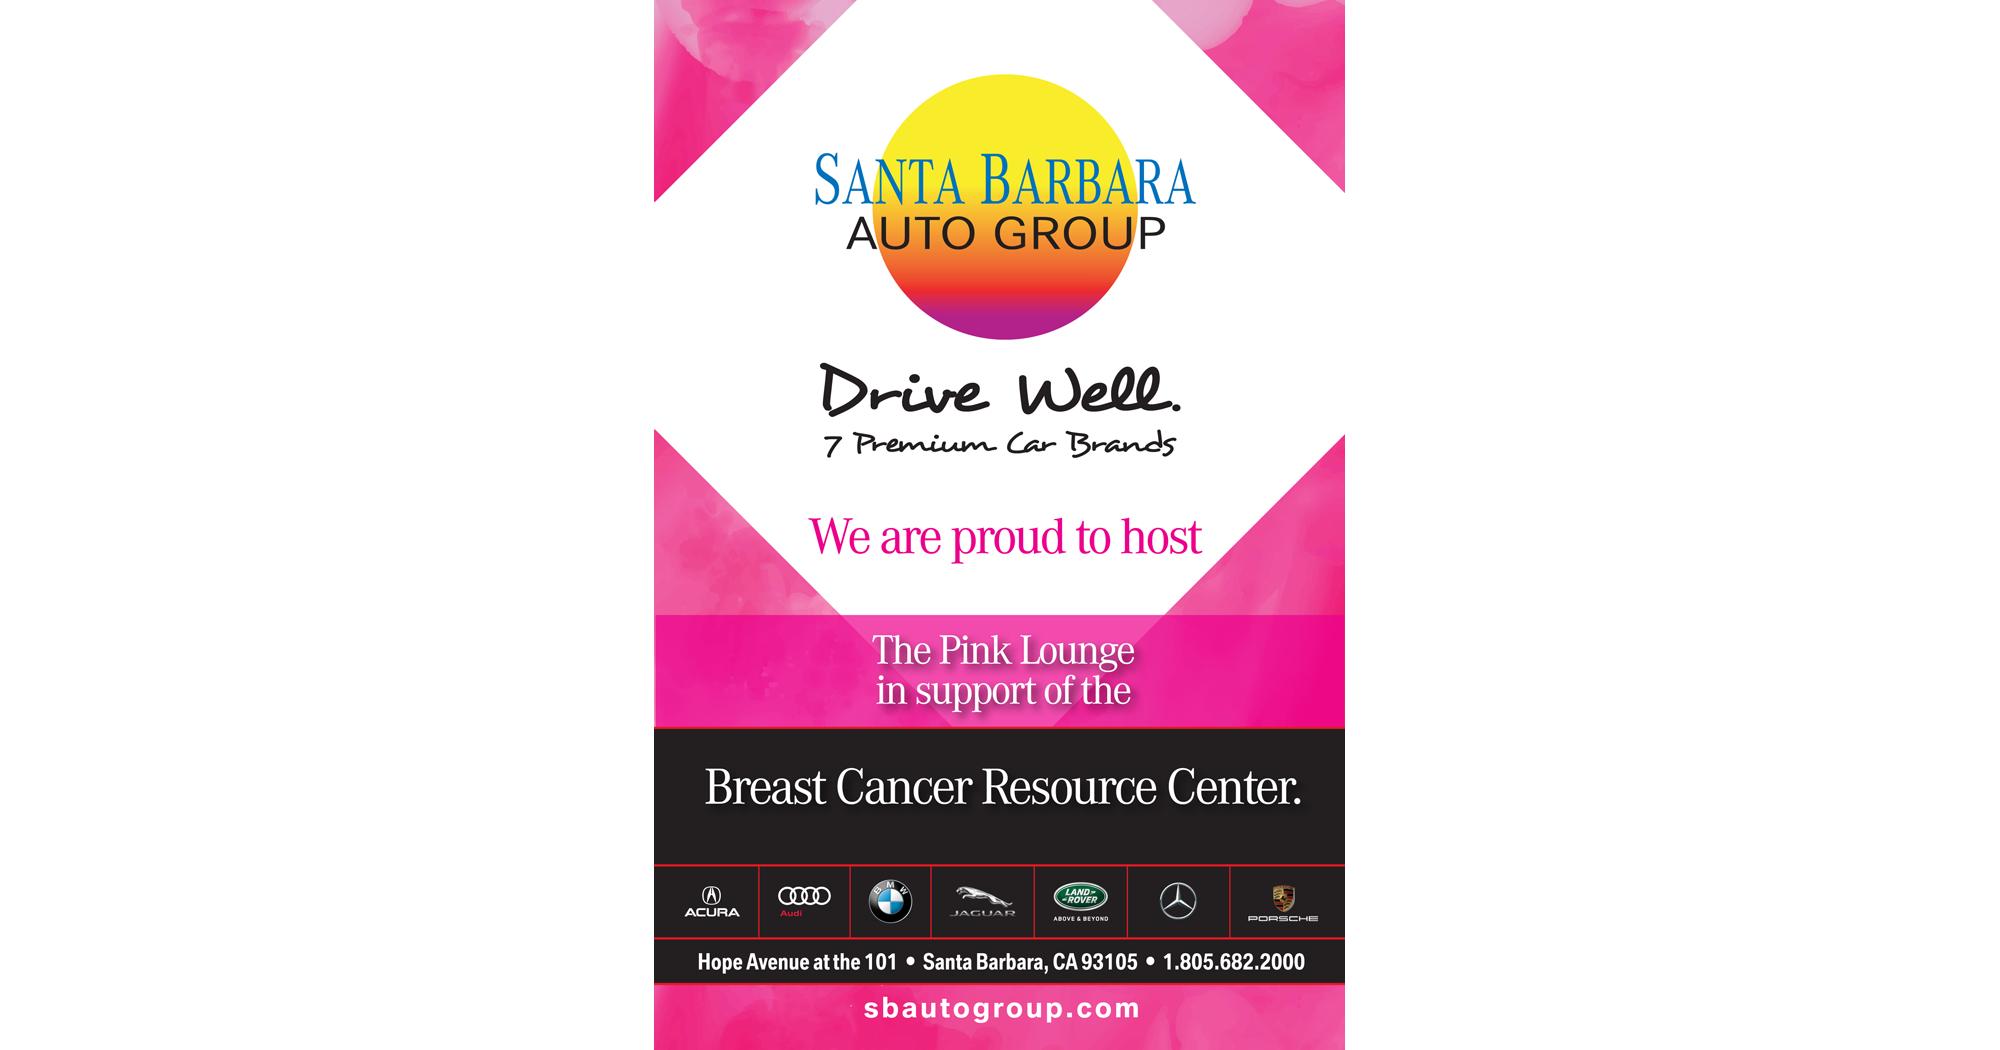 BMW Santa Barbara Supports Breast Cancer Resource Center